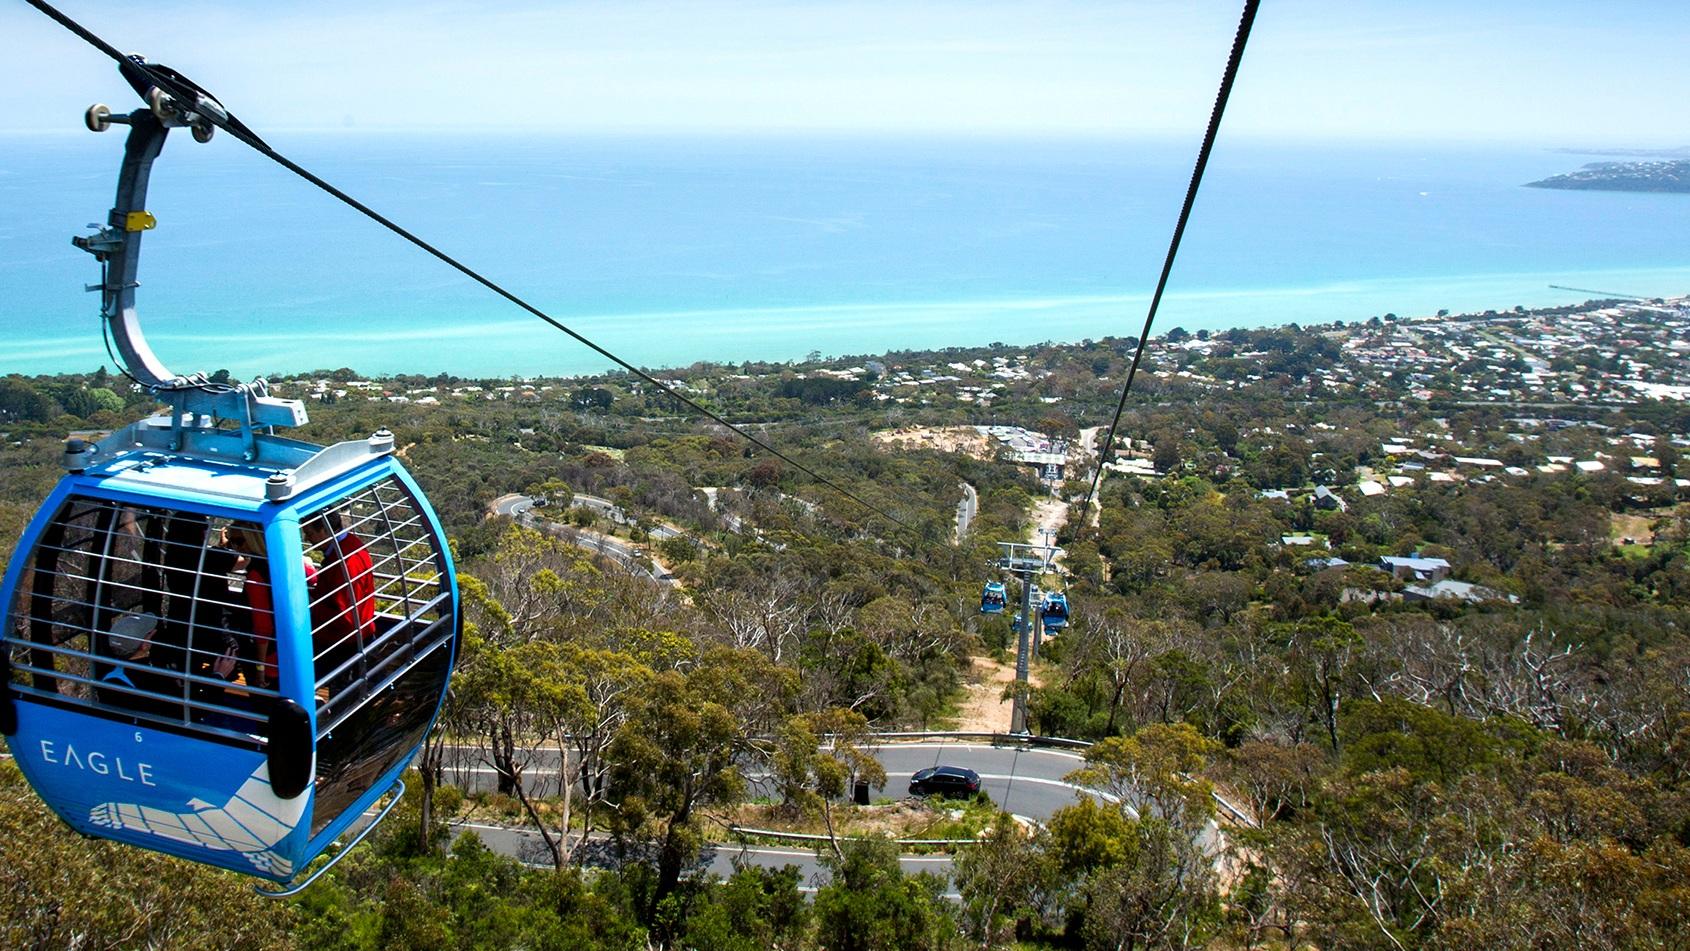 Arthurs Seat Eagle gondola on the Mornington Peninsula, Victoria.